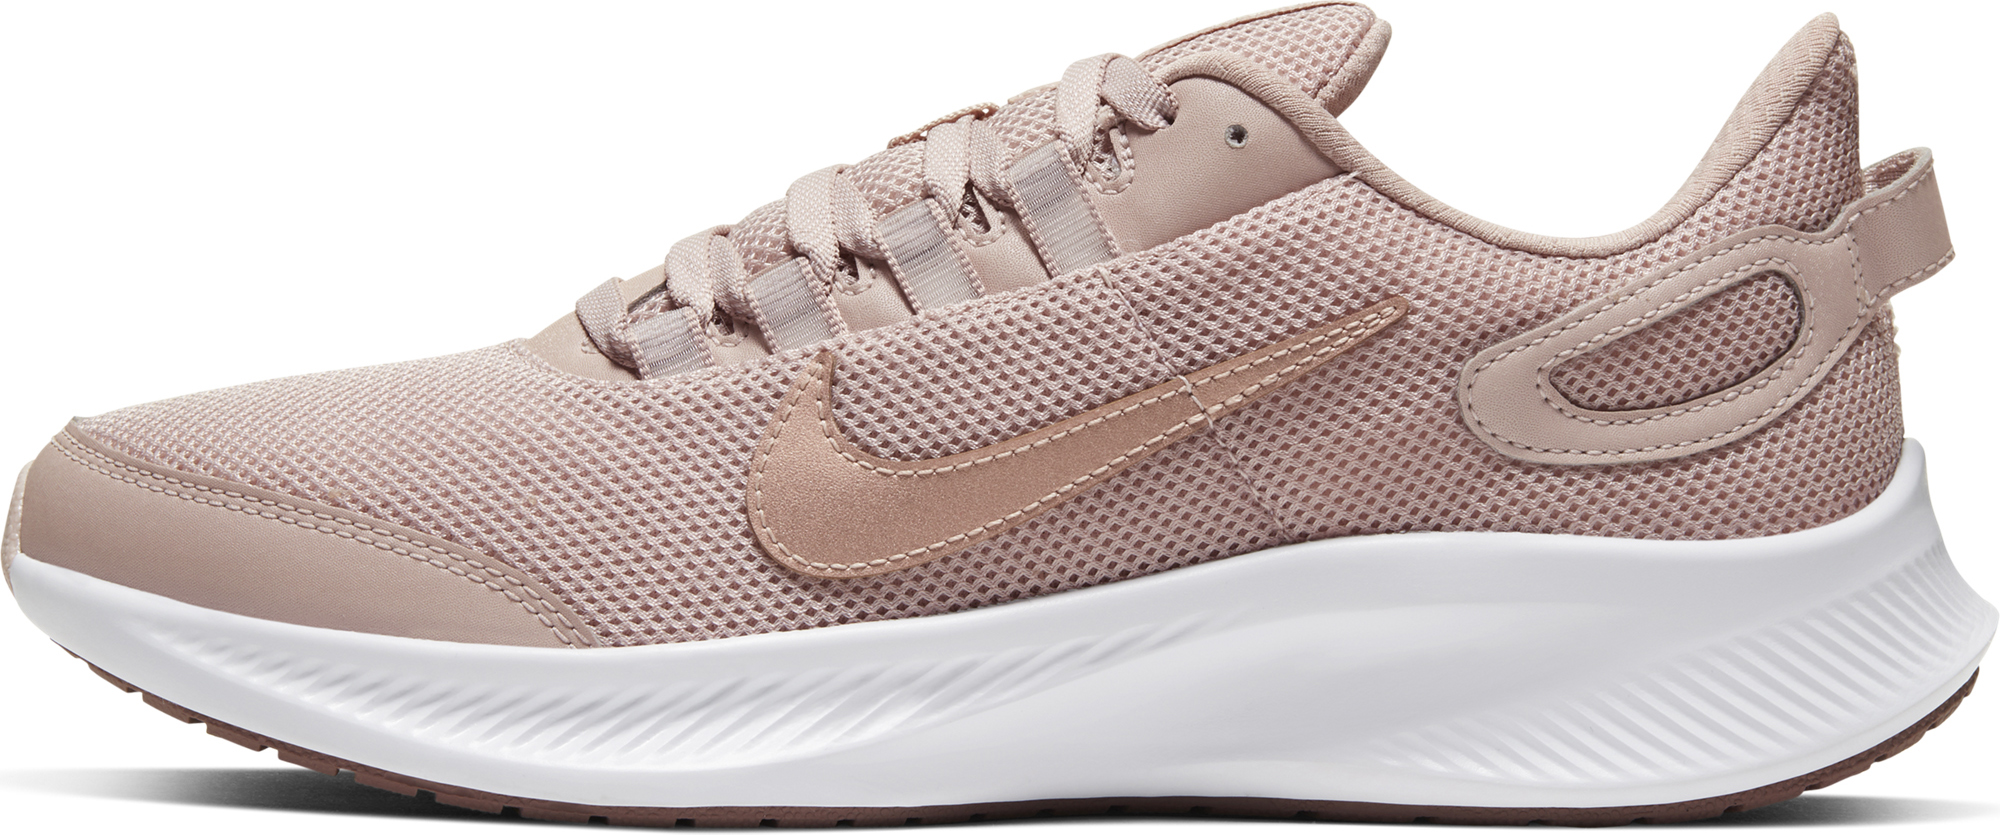 Nike Кроссовки женские Run All Day 2, размер 39